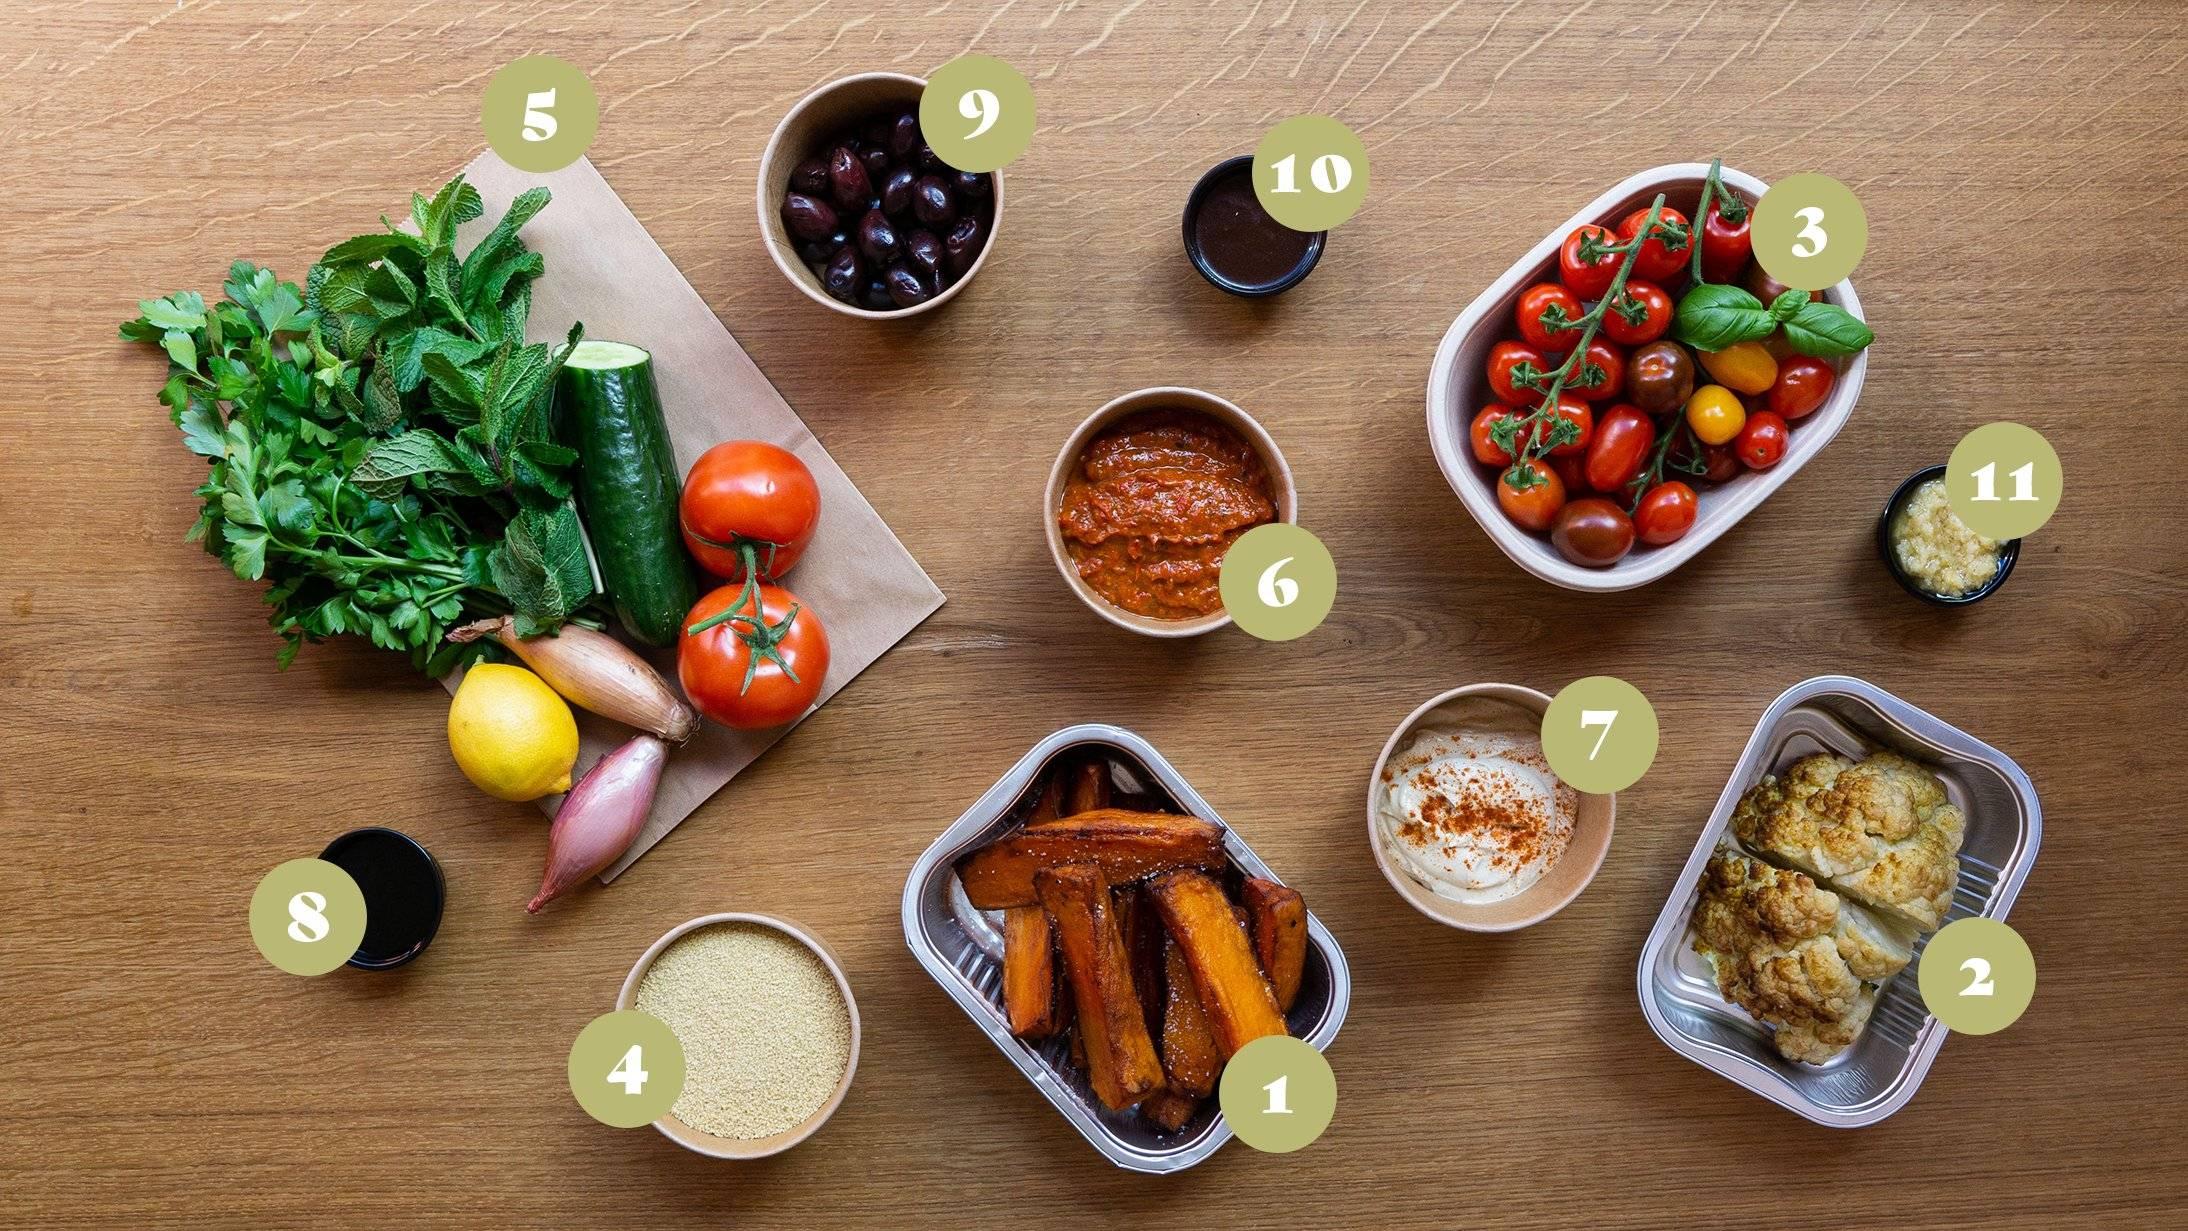 Opskrift og vejledning til Middelhavs Mezze med bl.a. sød kartoffel fritter, roasted cauliflower  med tahini, tomatsalat med Kalamata oliven og tabouleh salat.